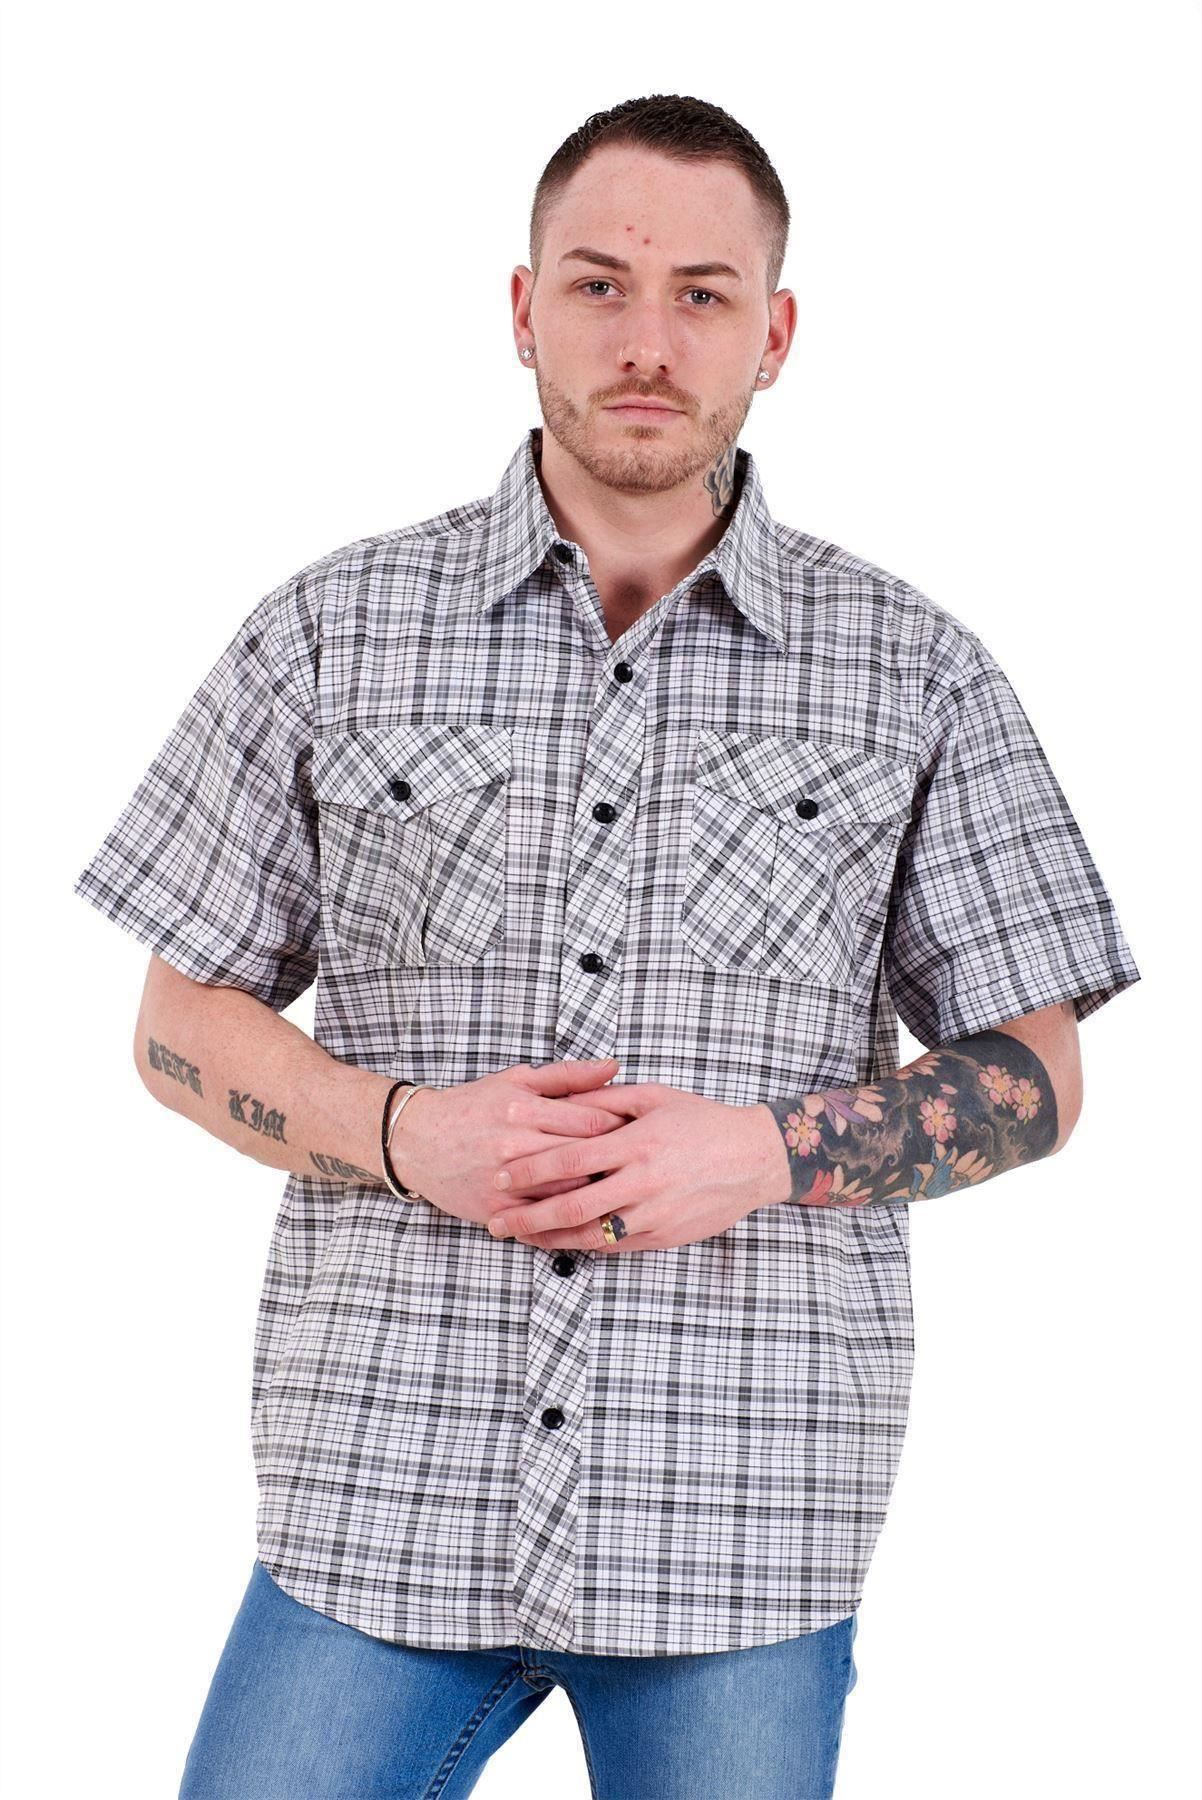 Mens-Regular-Big-Size-Shirts-Checked-Cotton-Blend-Casual-Short-Sleeve-M-to-5XL thumbnail 15